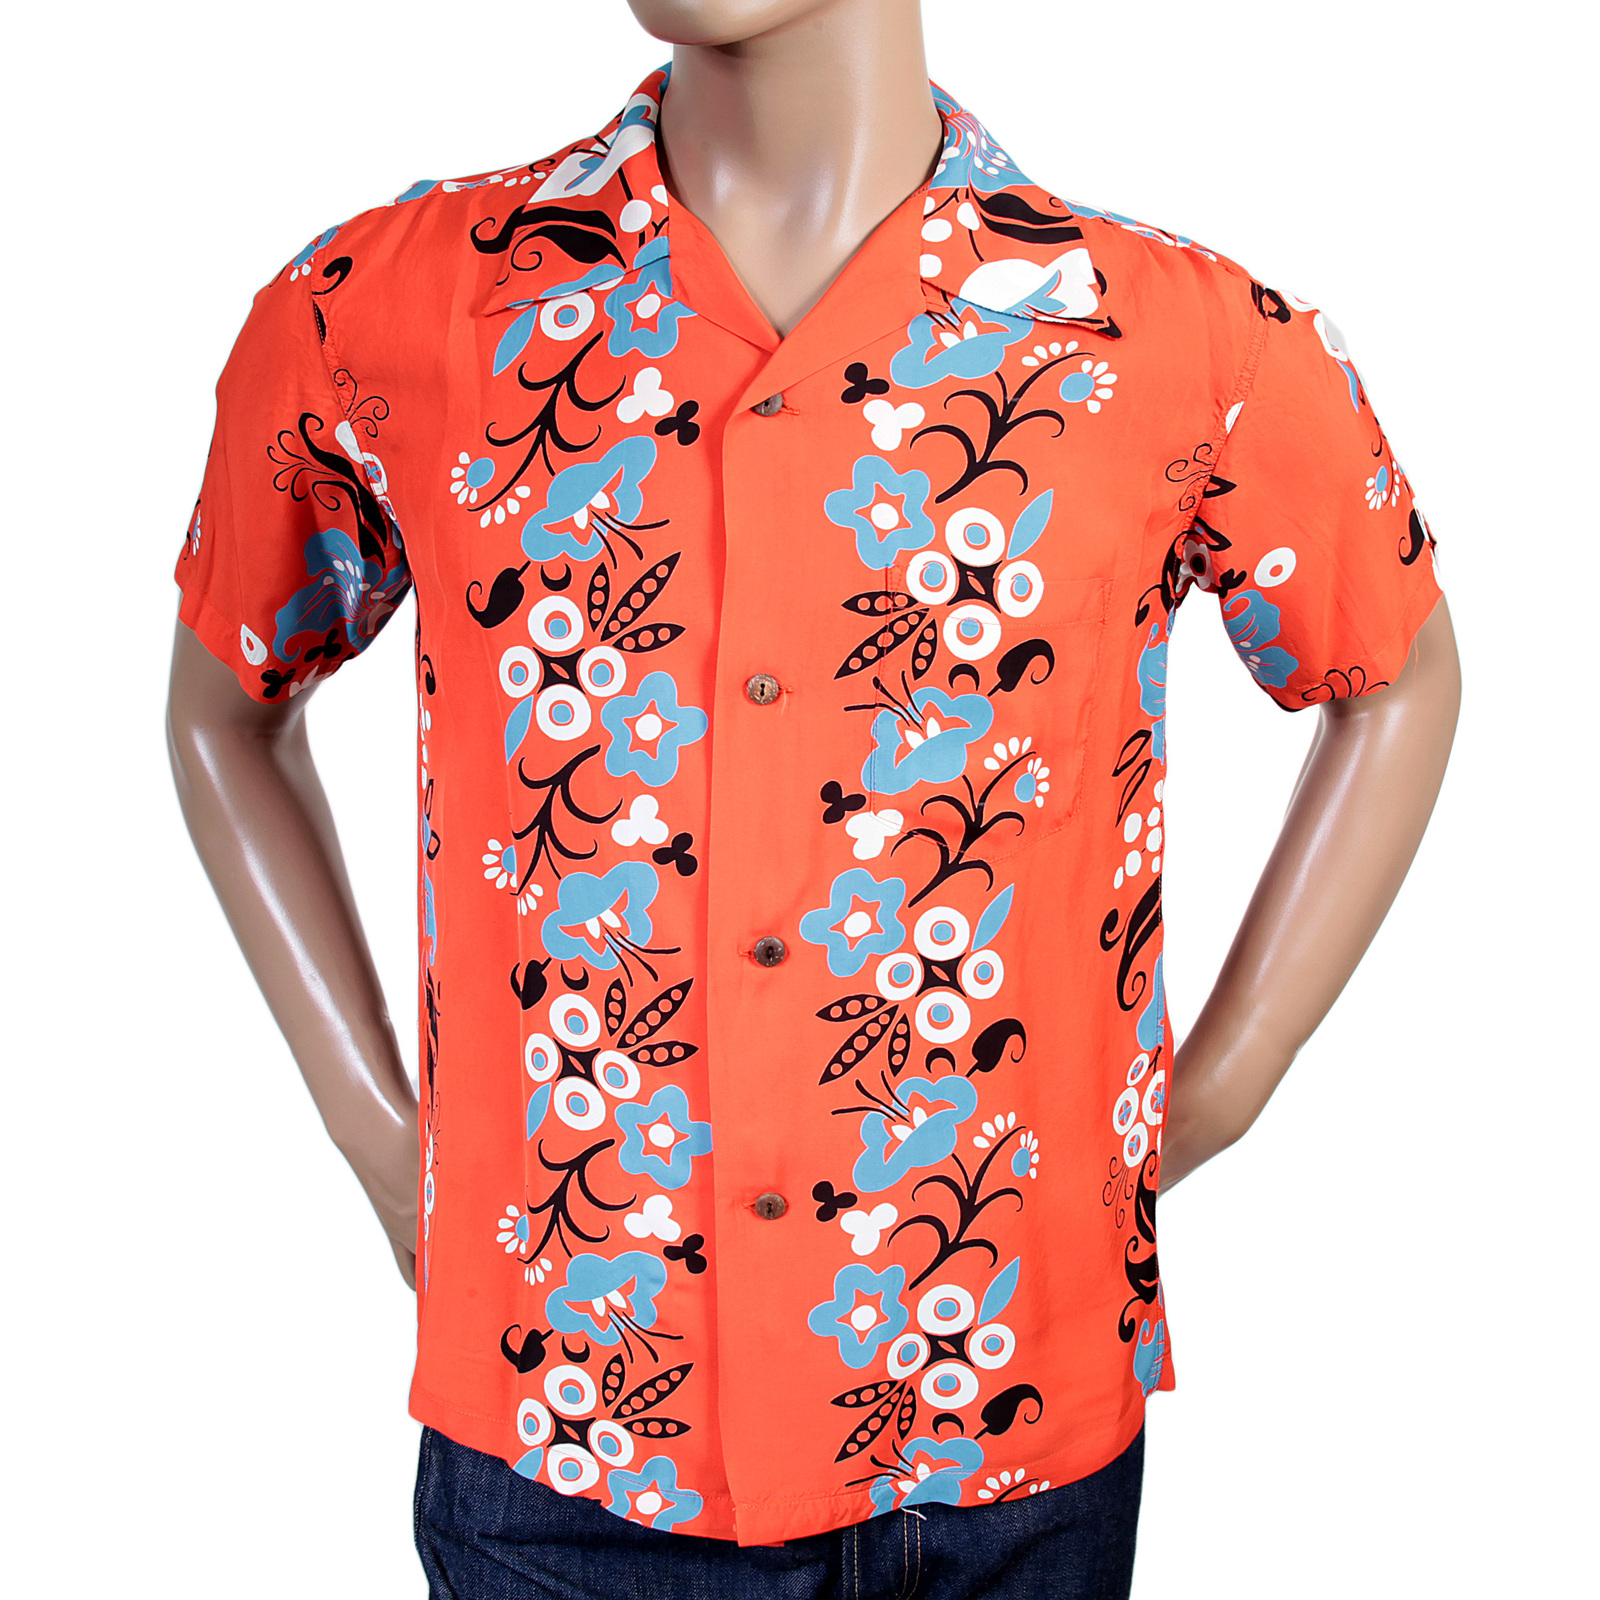 SunSurf Hawaiian Floral Print Shirt with Cuban Collar